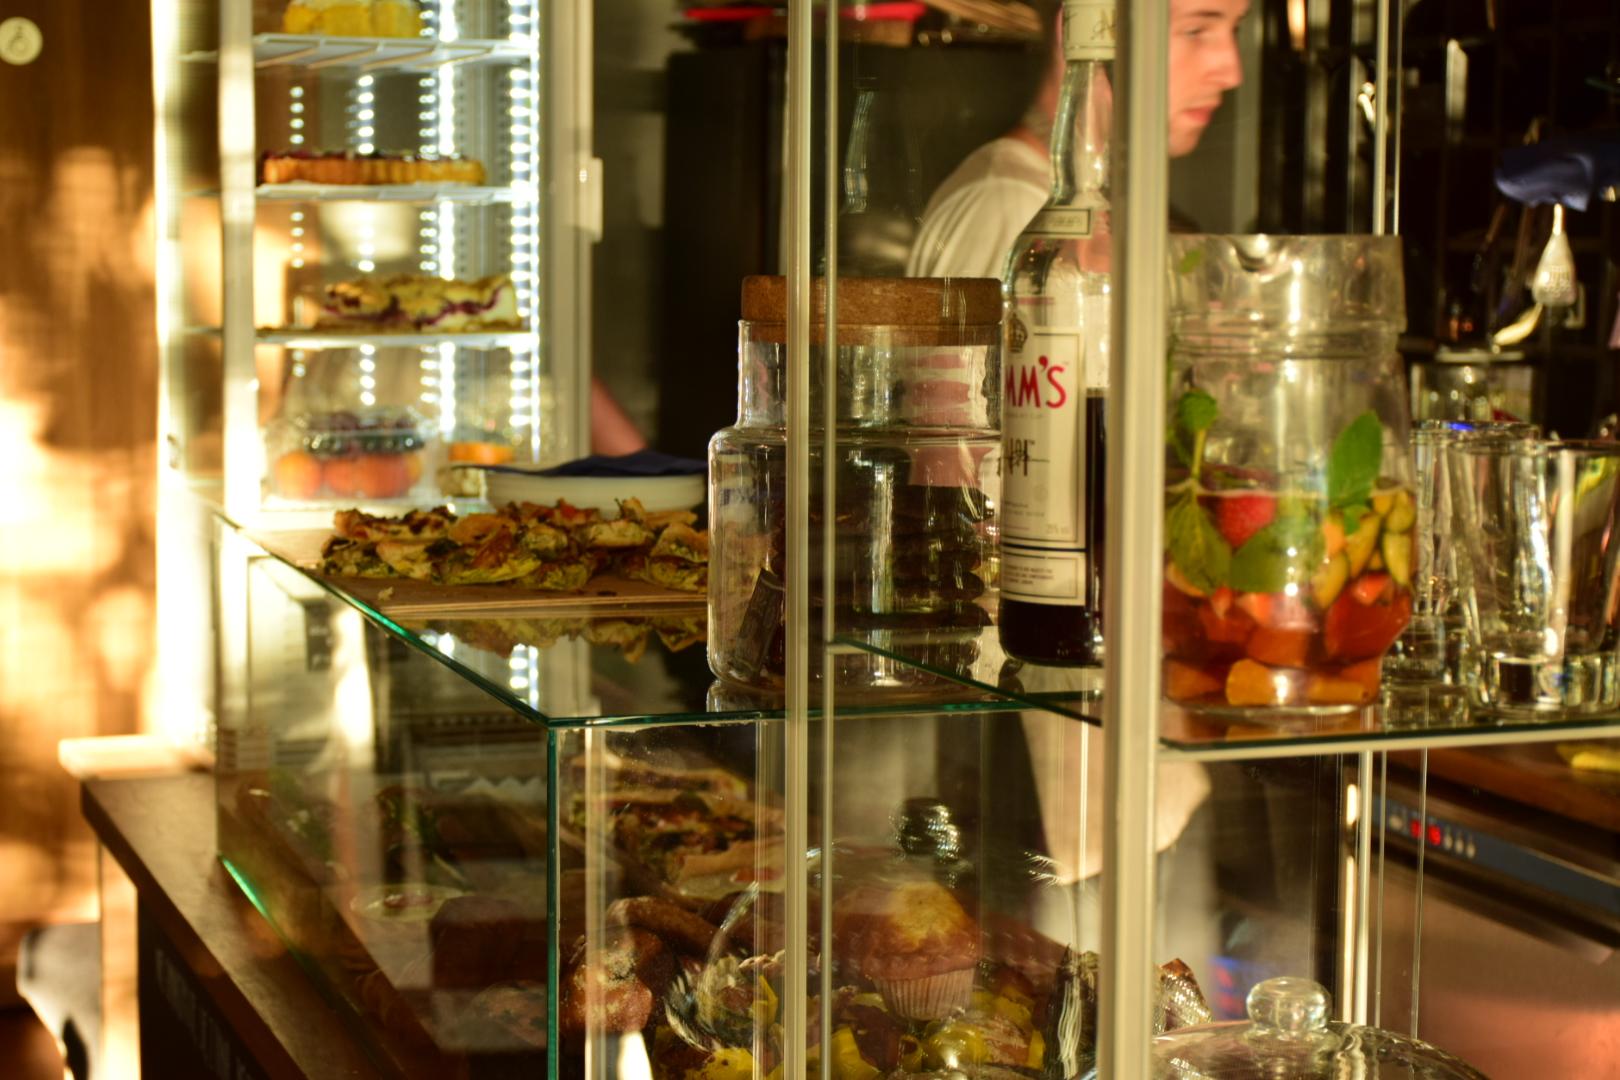 Kofeina cafe, photo: Michal Gornisiewicz